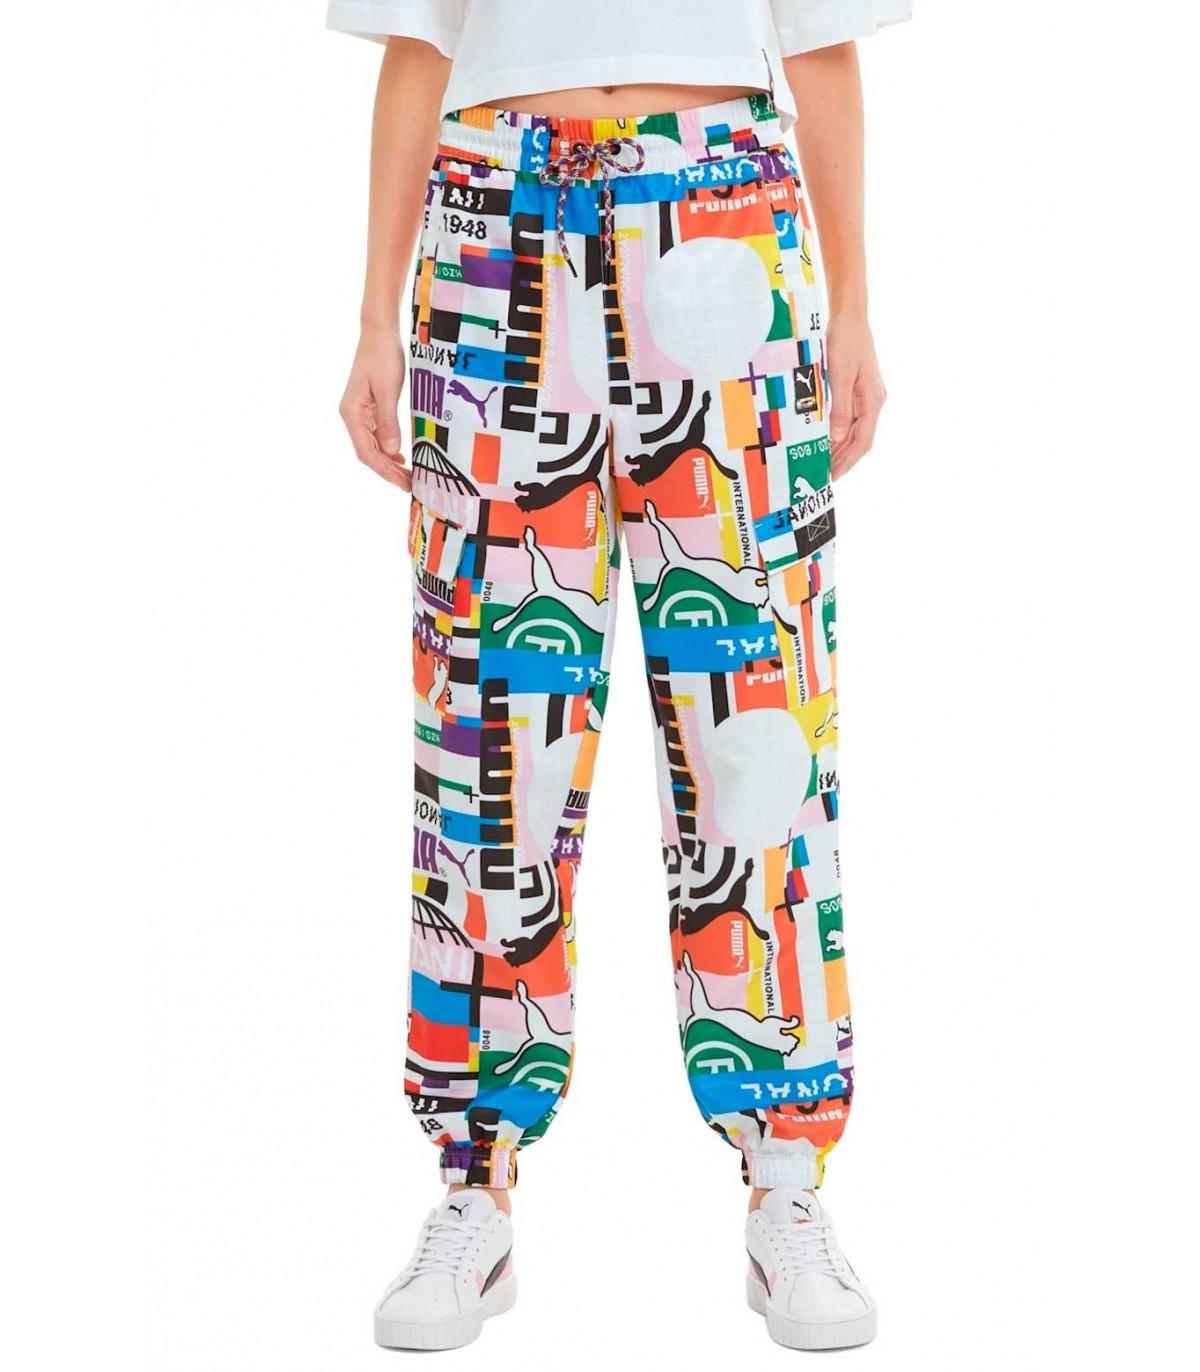 Pantalon Puma Chandal Para Mujer International Estampado